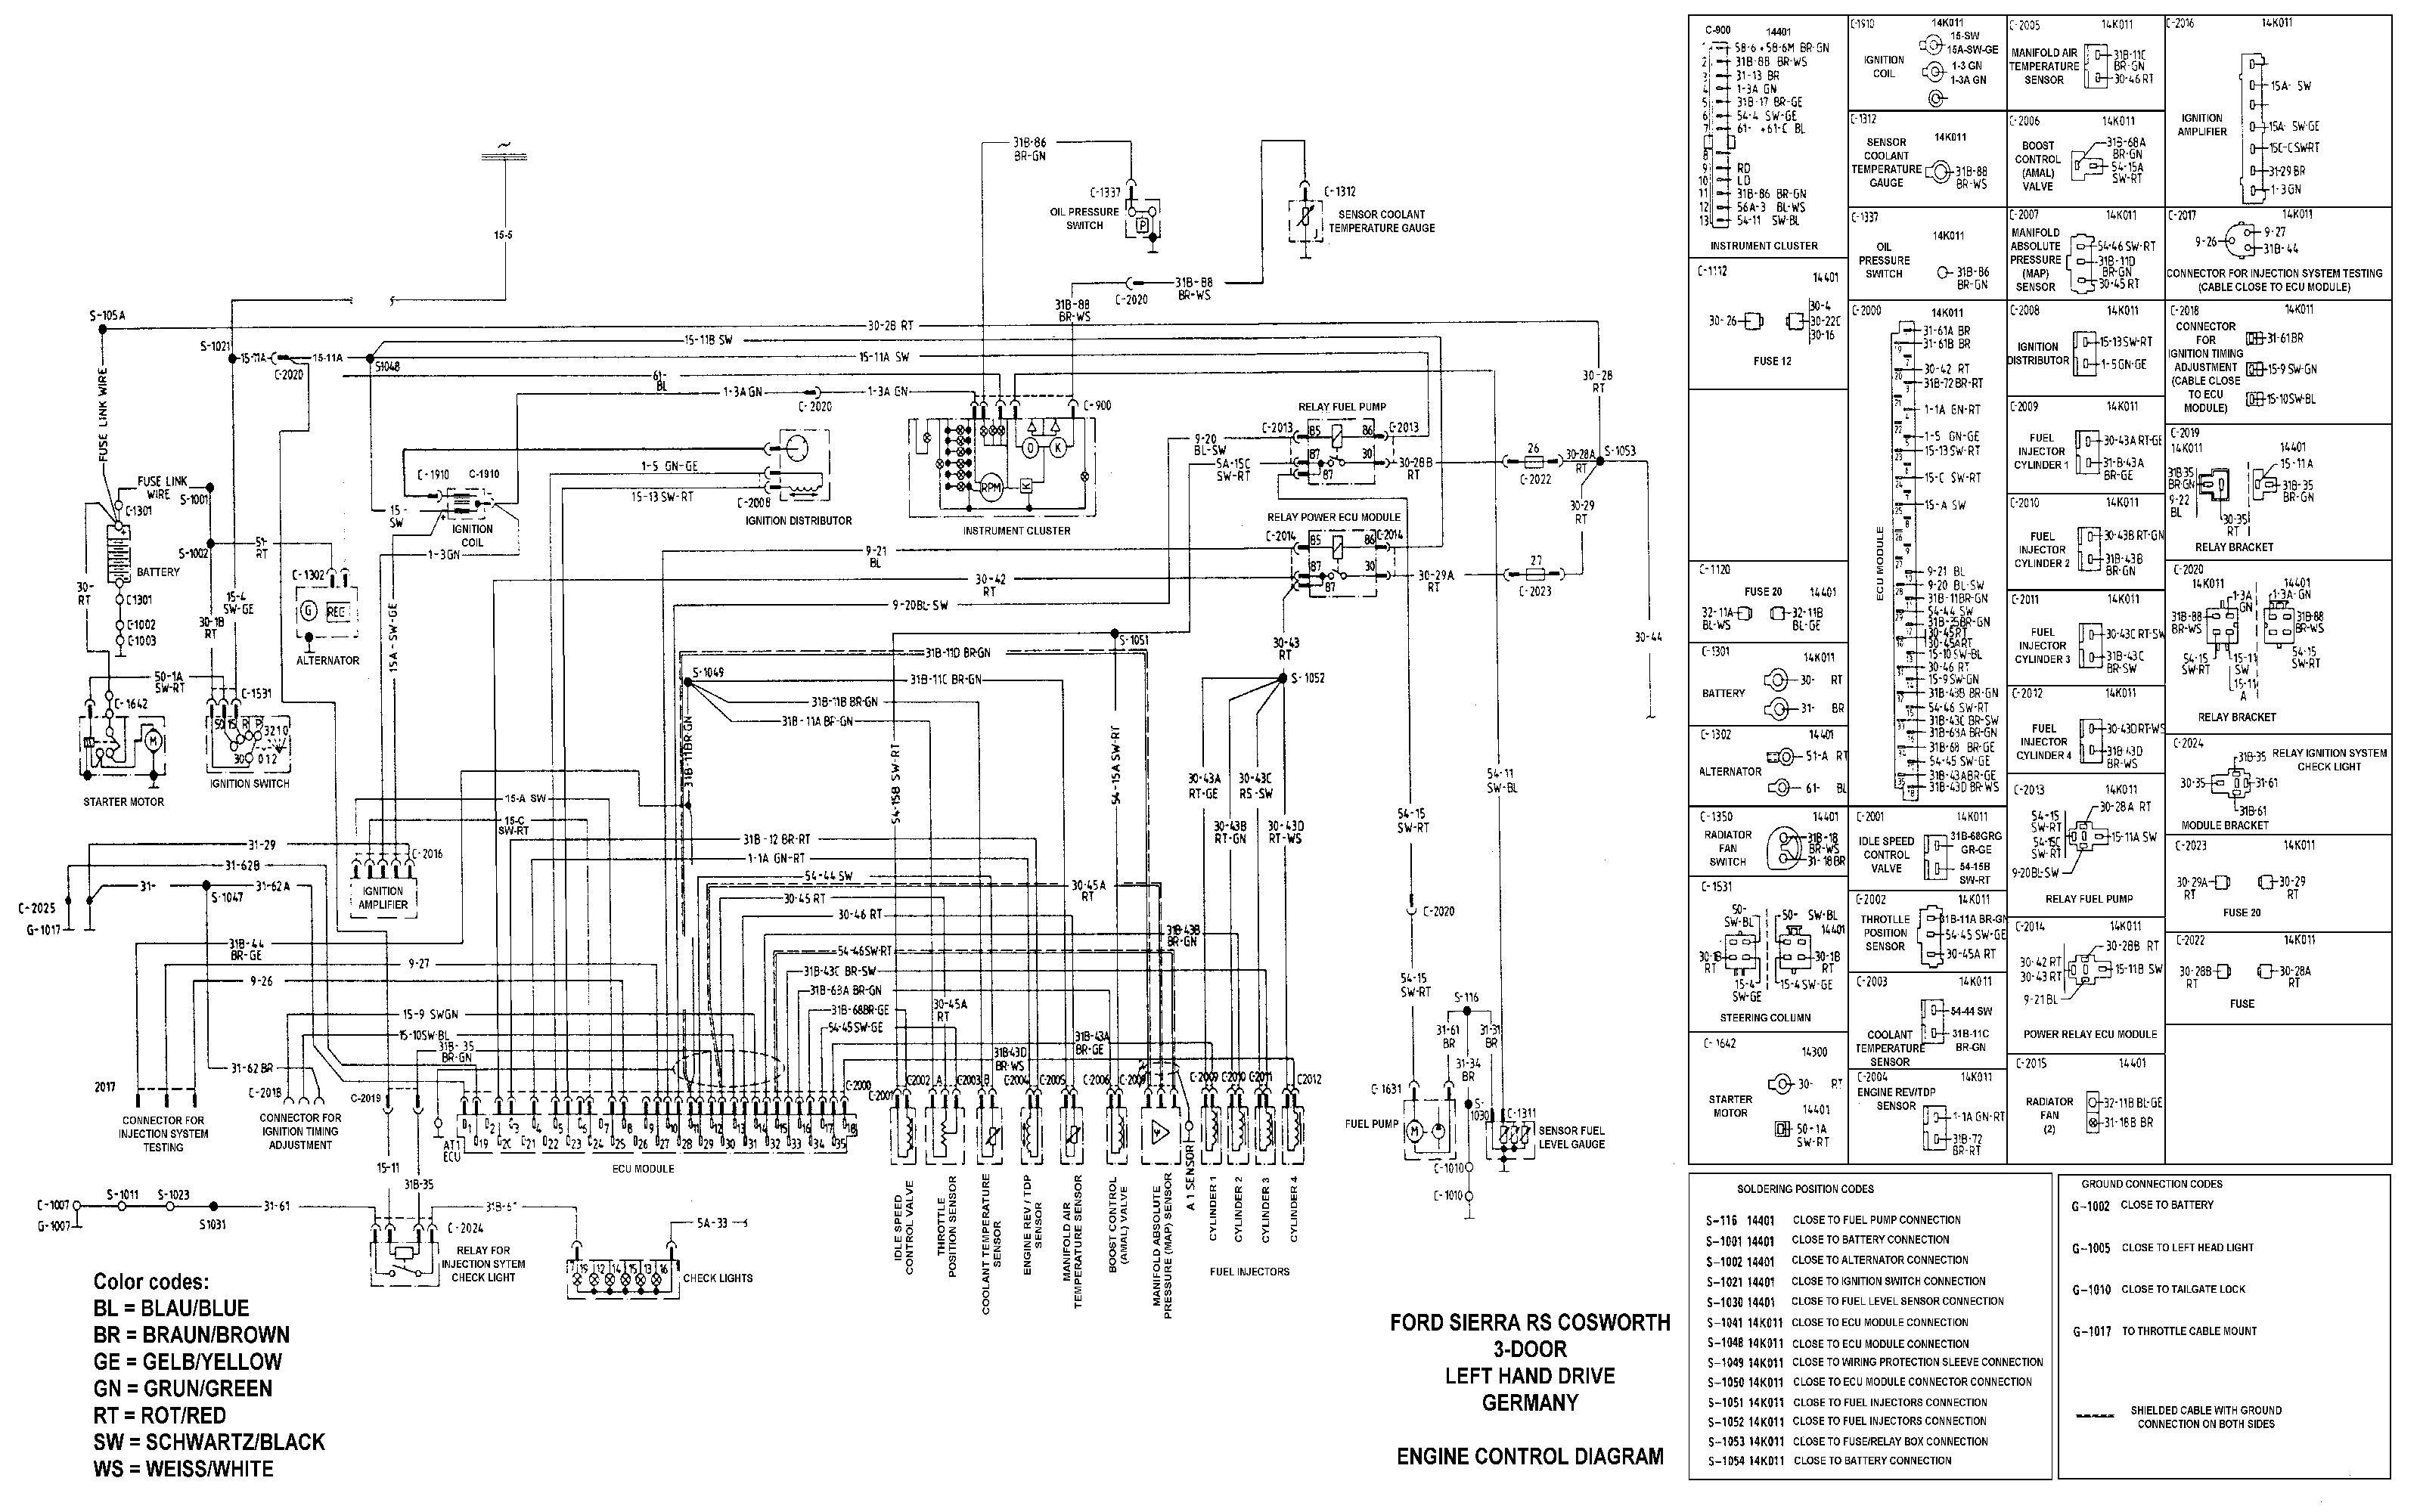 Ford Alternator Wiring Diagrams 04 Focus Wiring Diagram Of Ford Alternator Wiring Diagrams